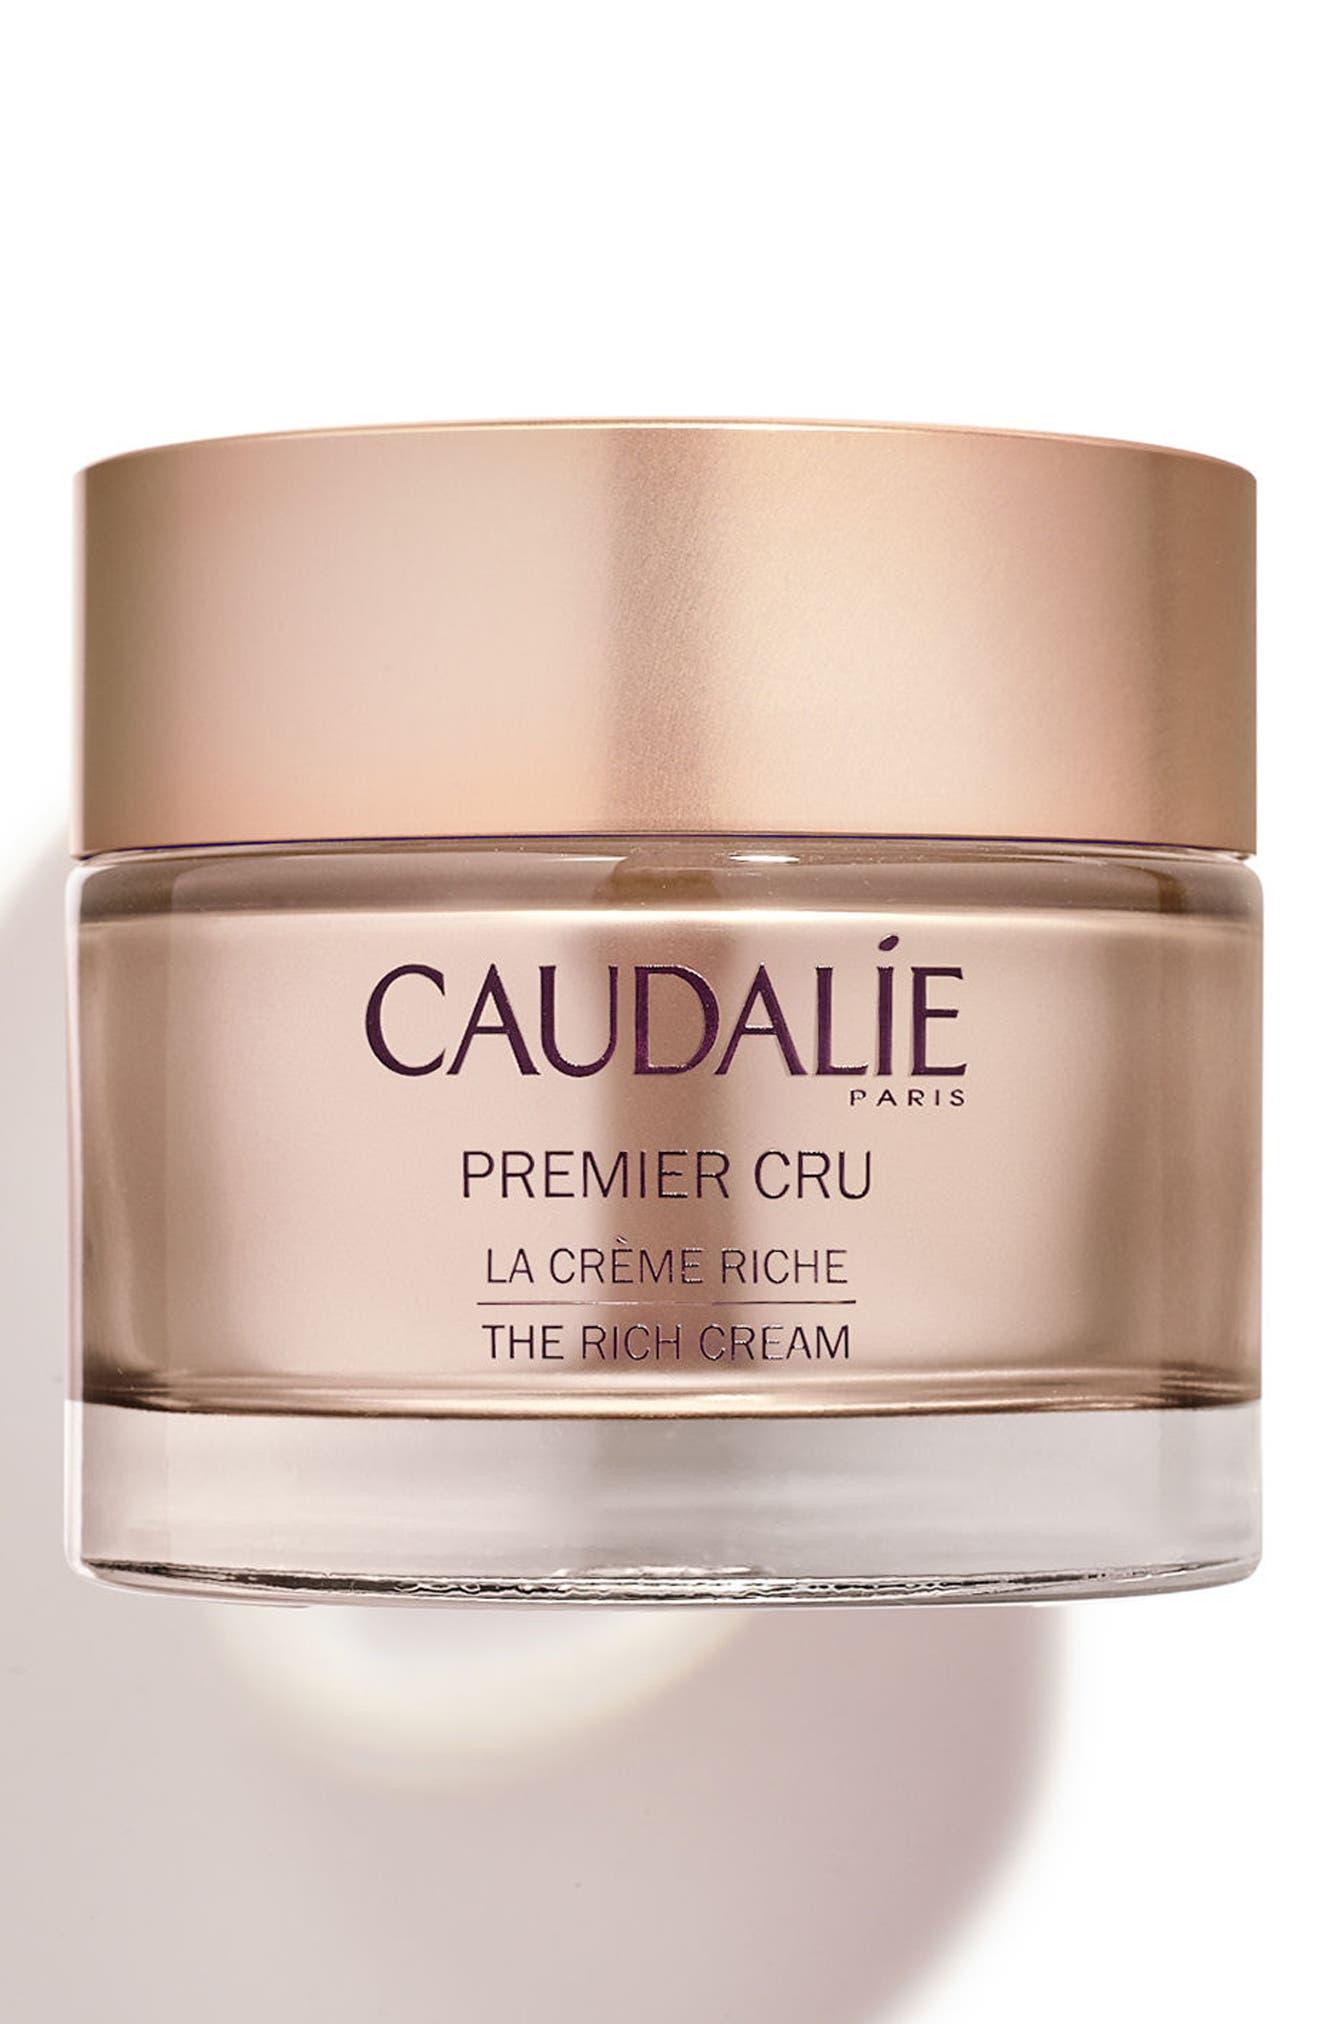 Caudalie Premier Cru The Rich Cream, Size 1.7 oz